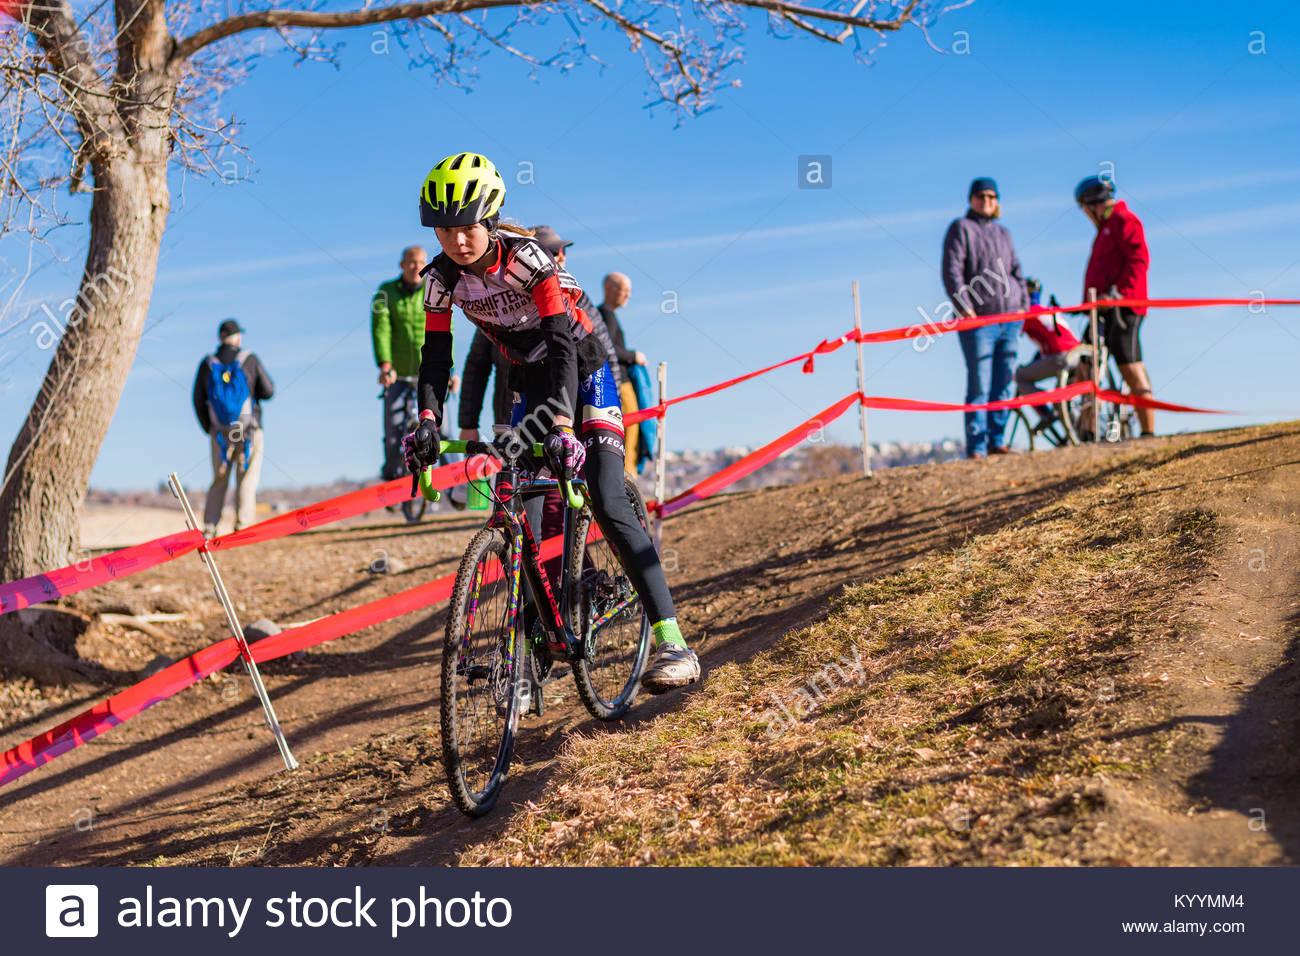 2018 USA Cyclocross National Championship in Reno, Nevada. - Stock Image